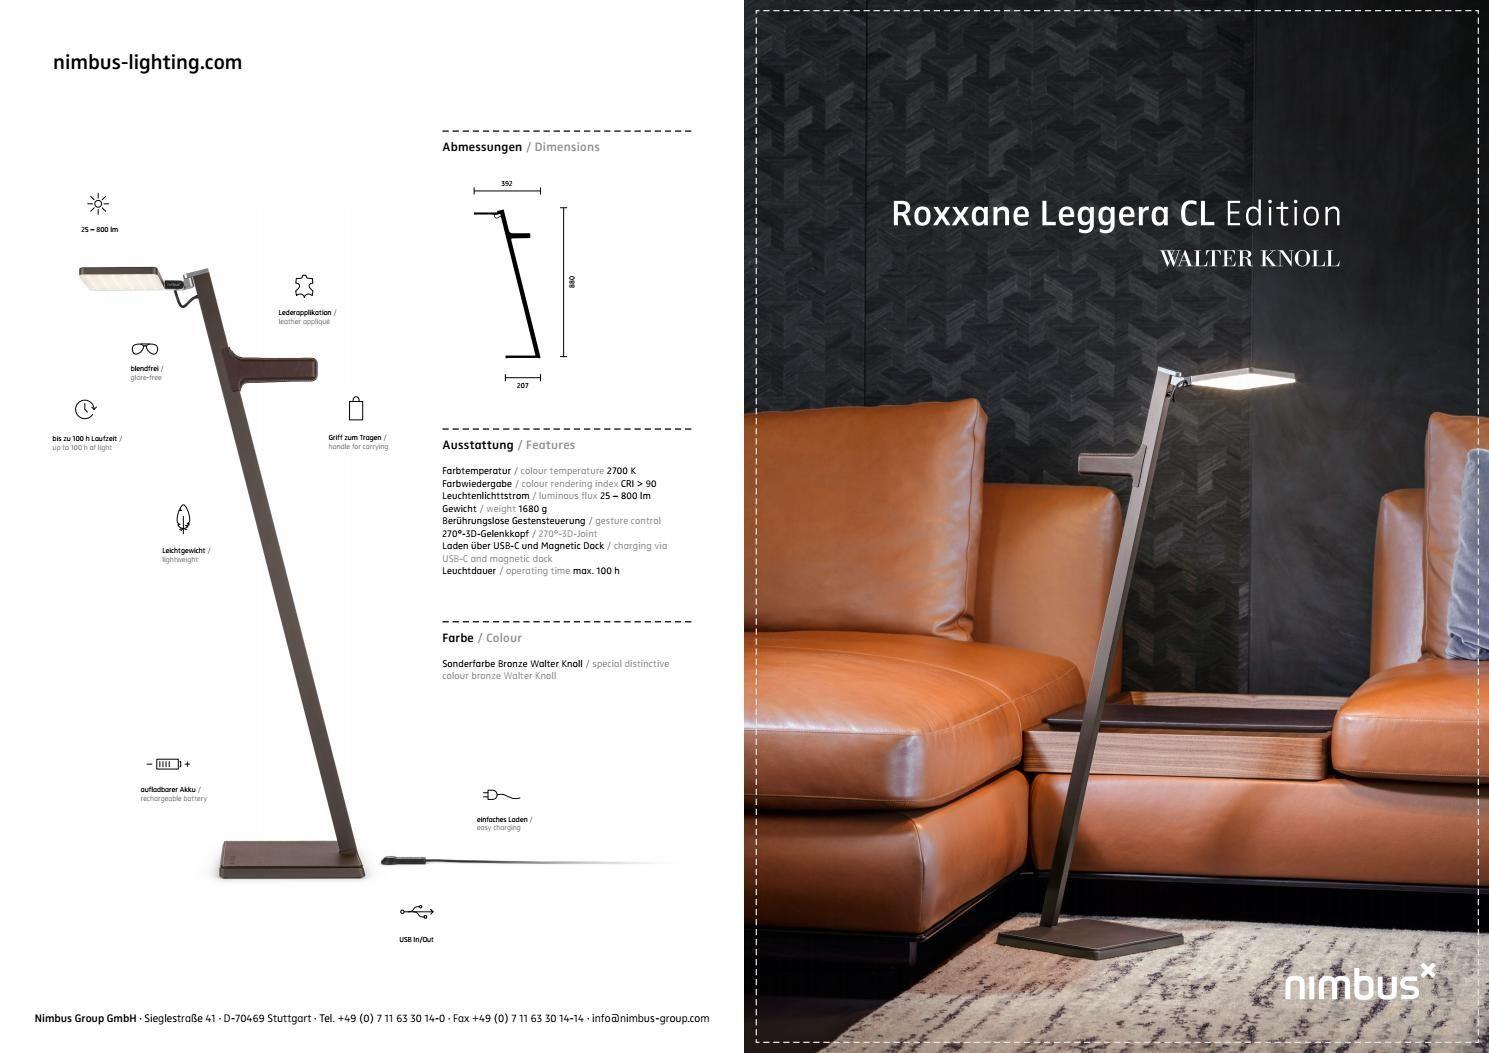 Roxxane Leggera Cl Edition Walter Knoll Walter Knoll Nimbus